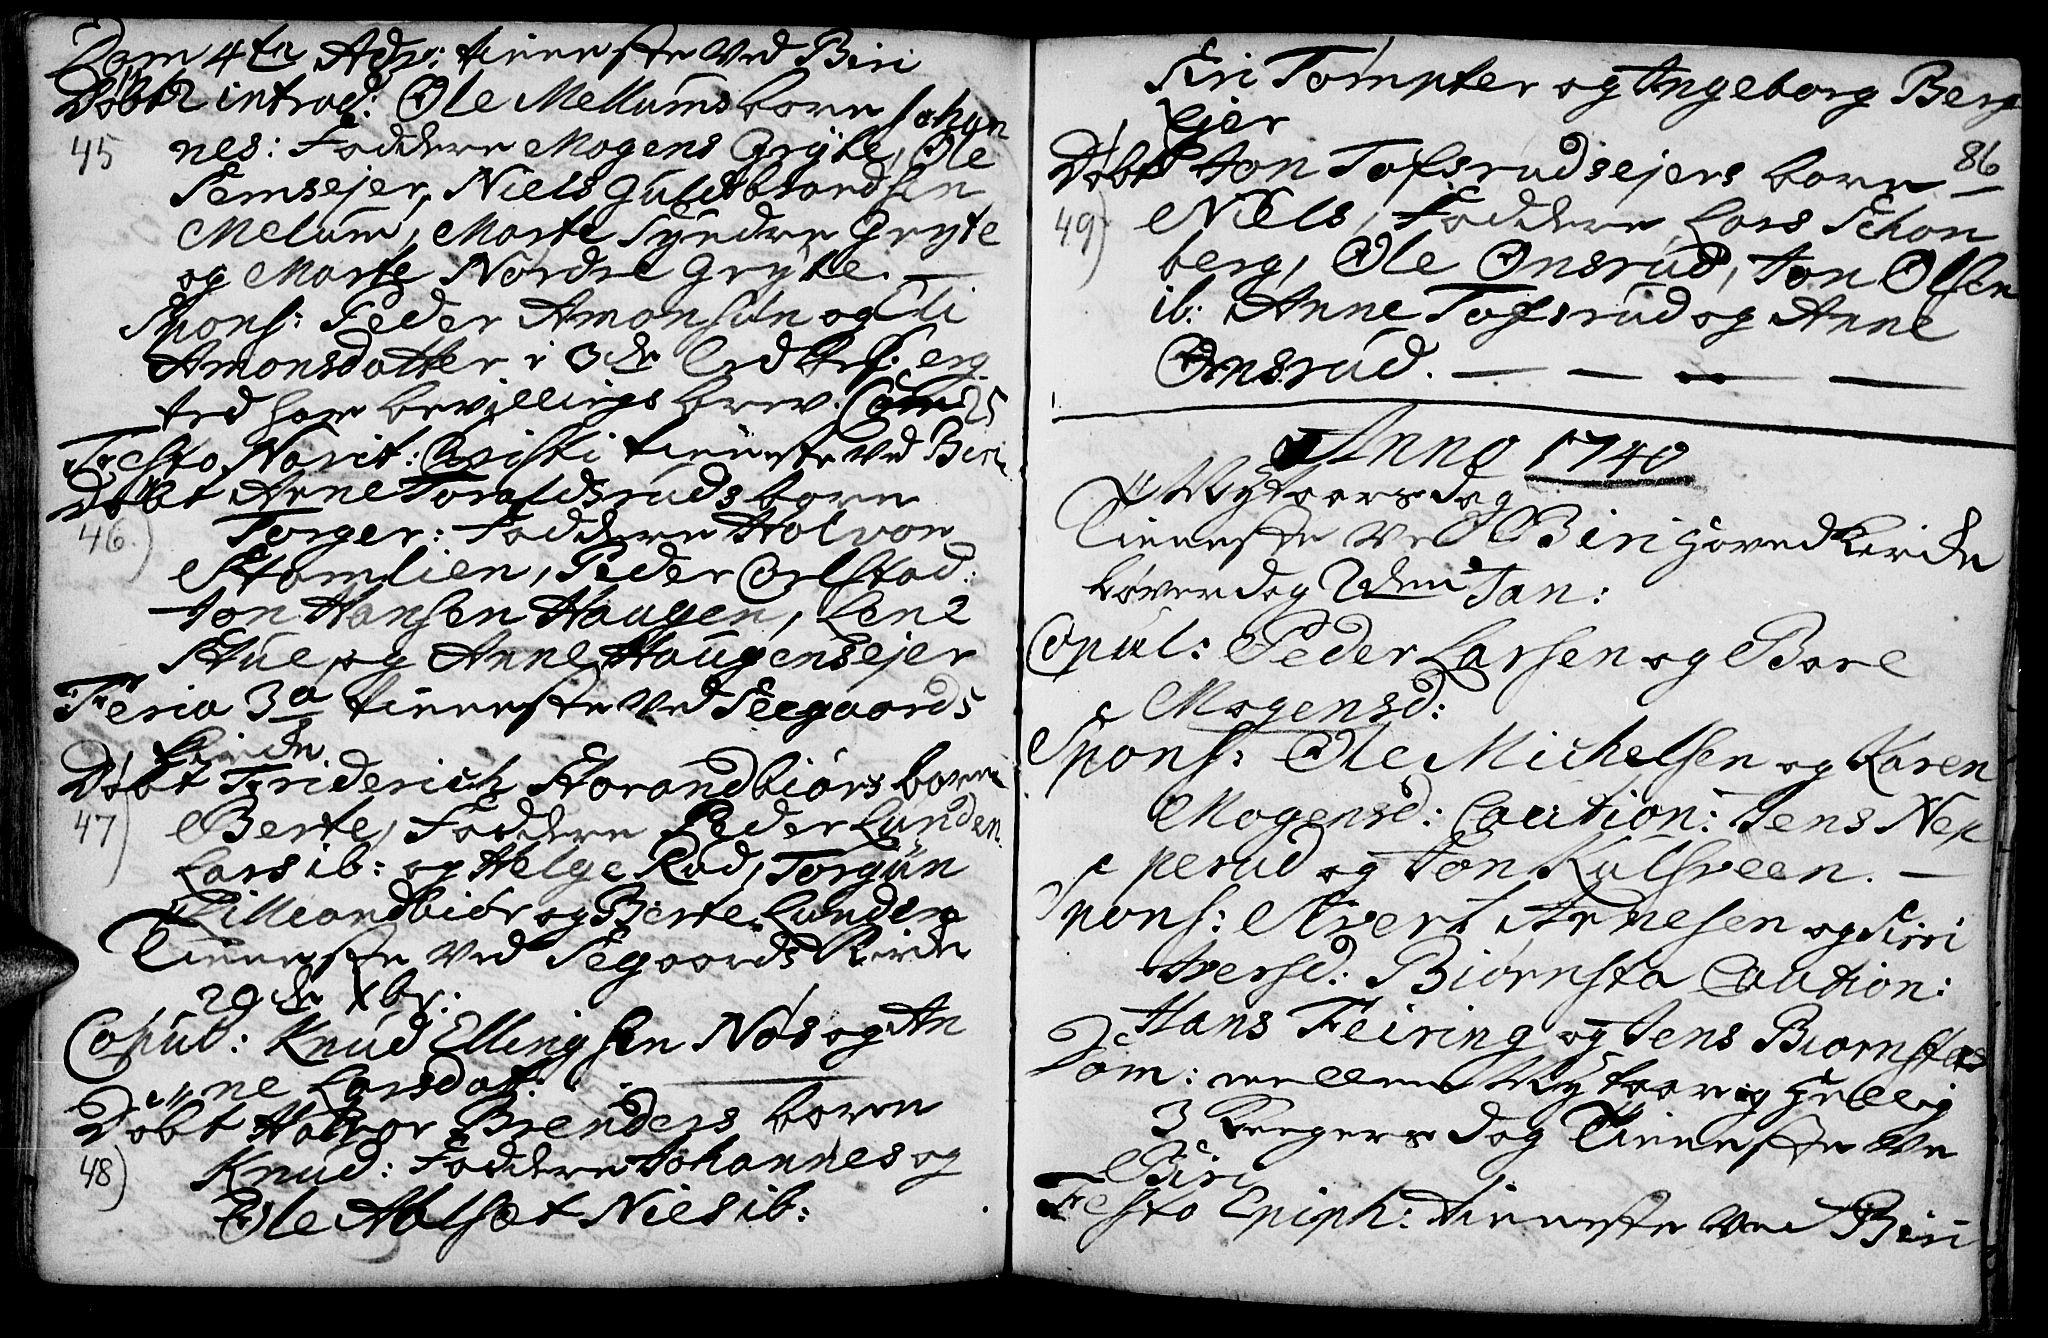 SAH, Biri prestekontor, Ministerialbok nr. 1, 1730-1754, s. 86